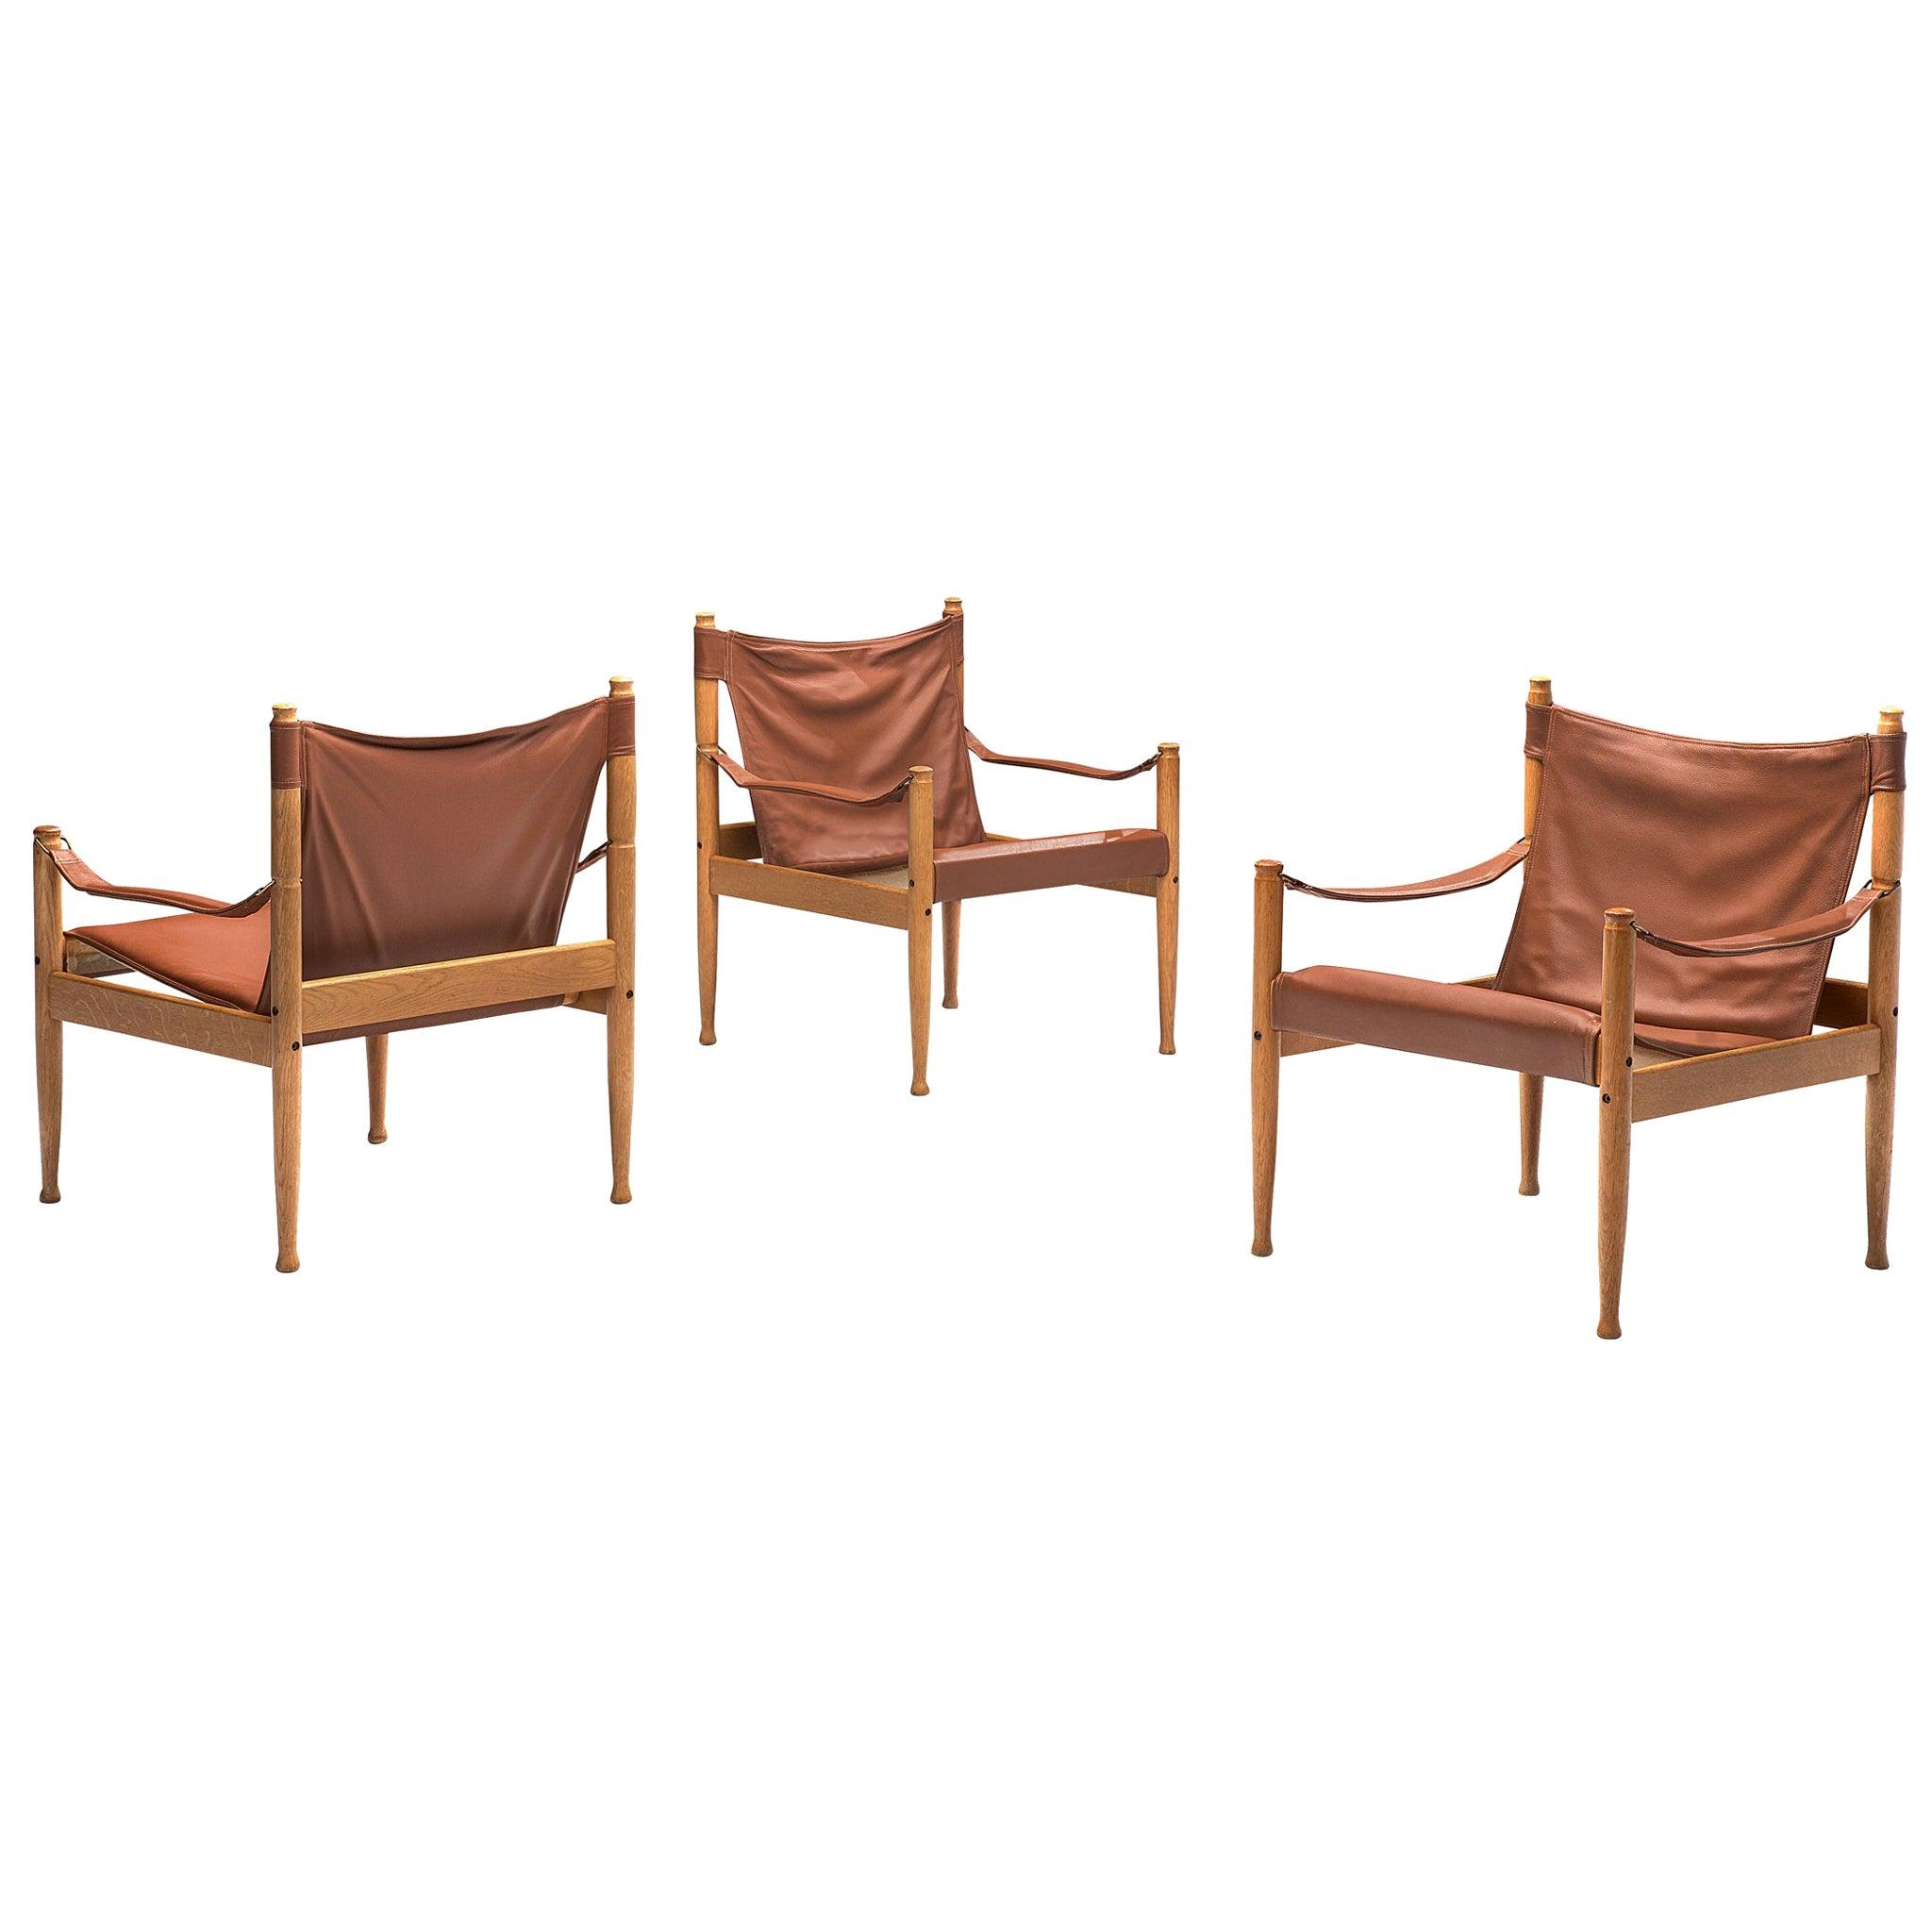 Erik Wørts Safari Chairs in Cognac Leather, 1960s